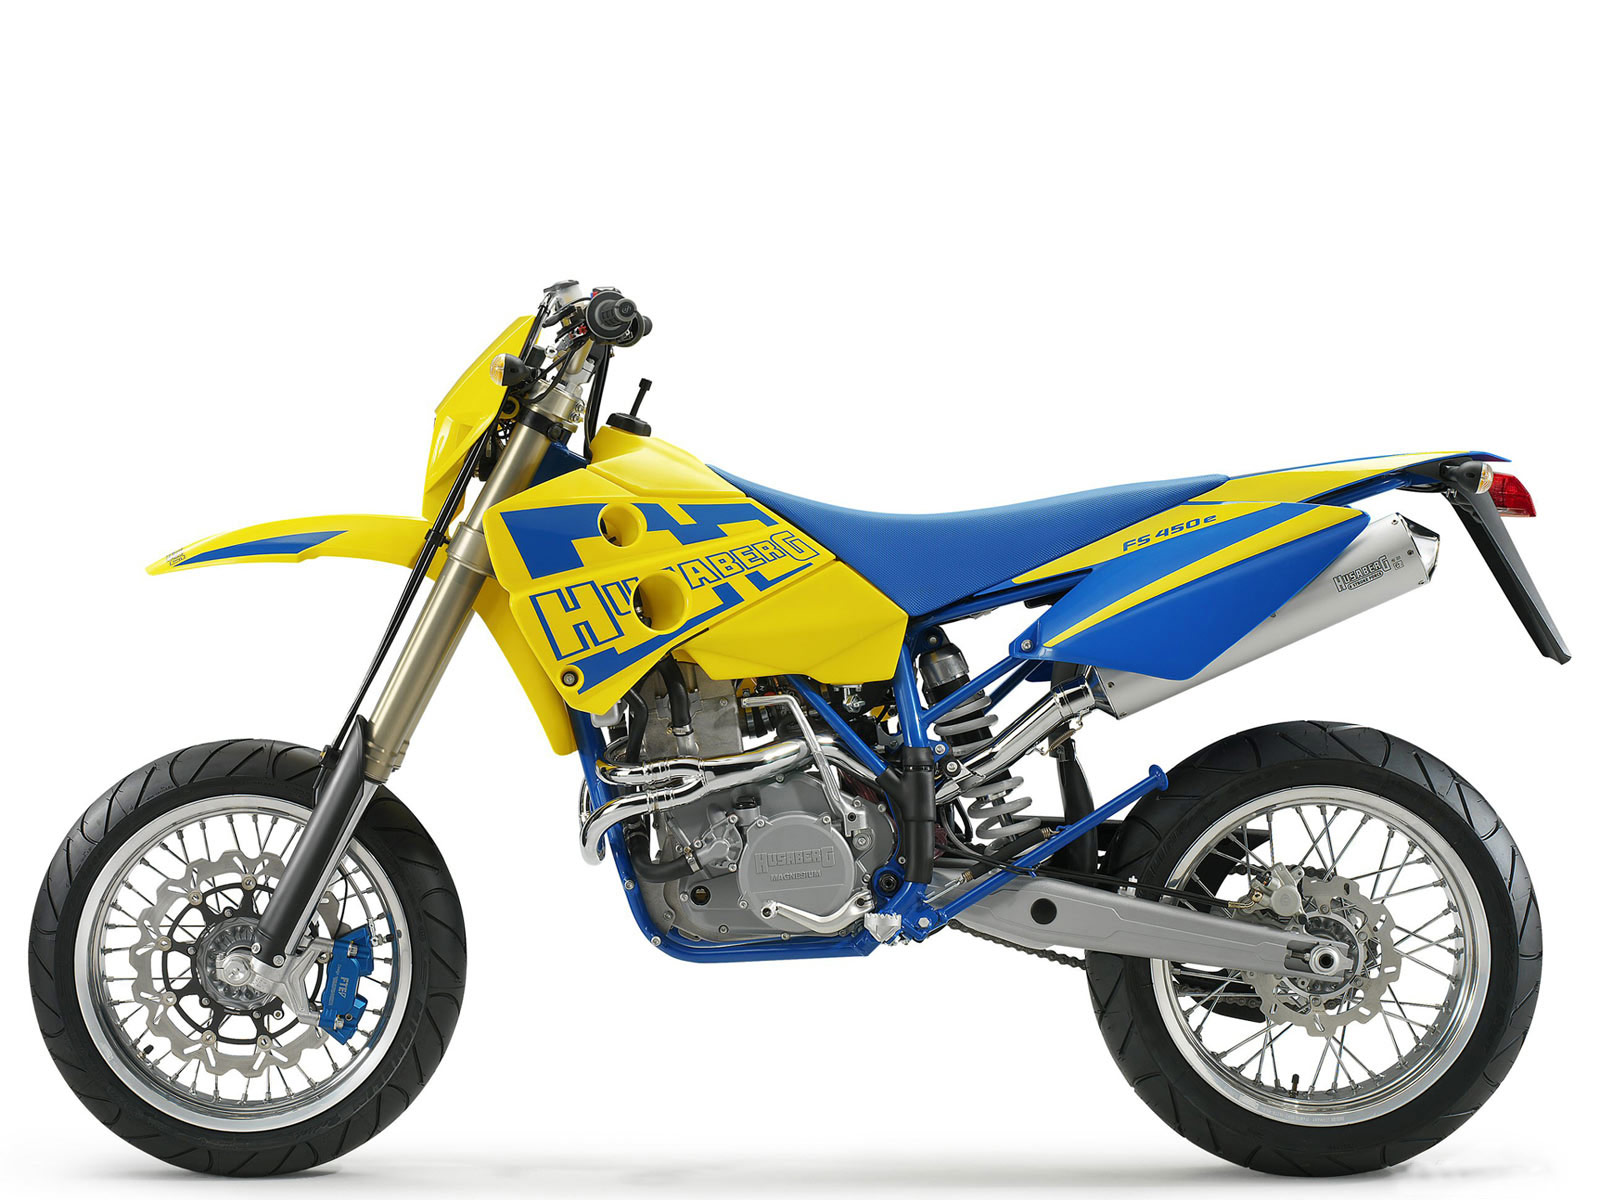 2005 HUSABERG FS450e Motorcycle Desktop Wallpaper